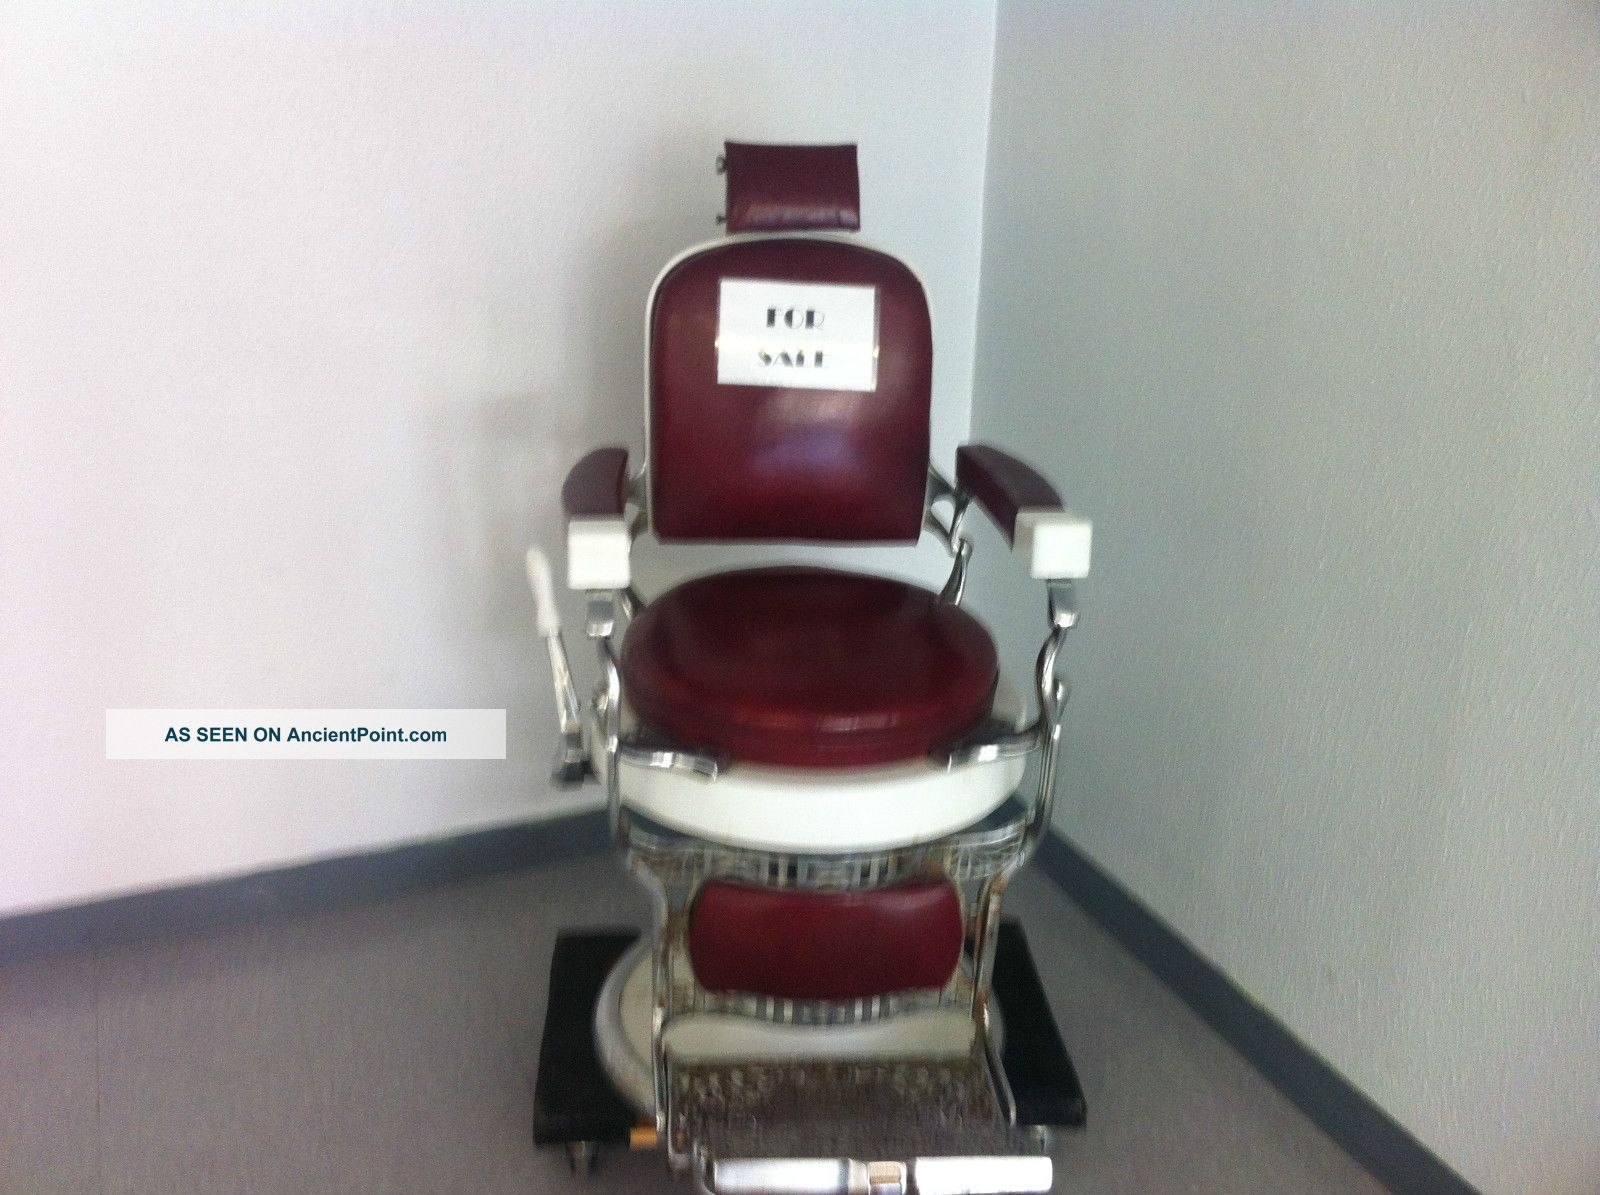 barber design mebrureoral ideas the koken accessories chair